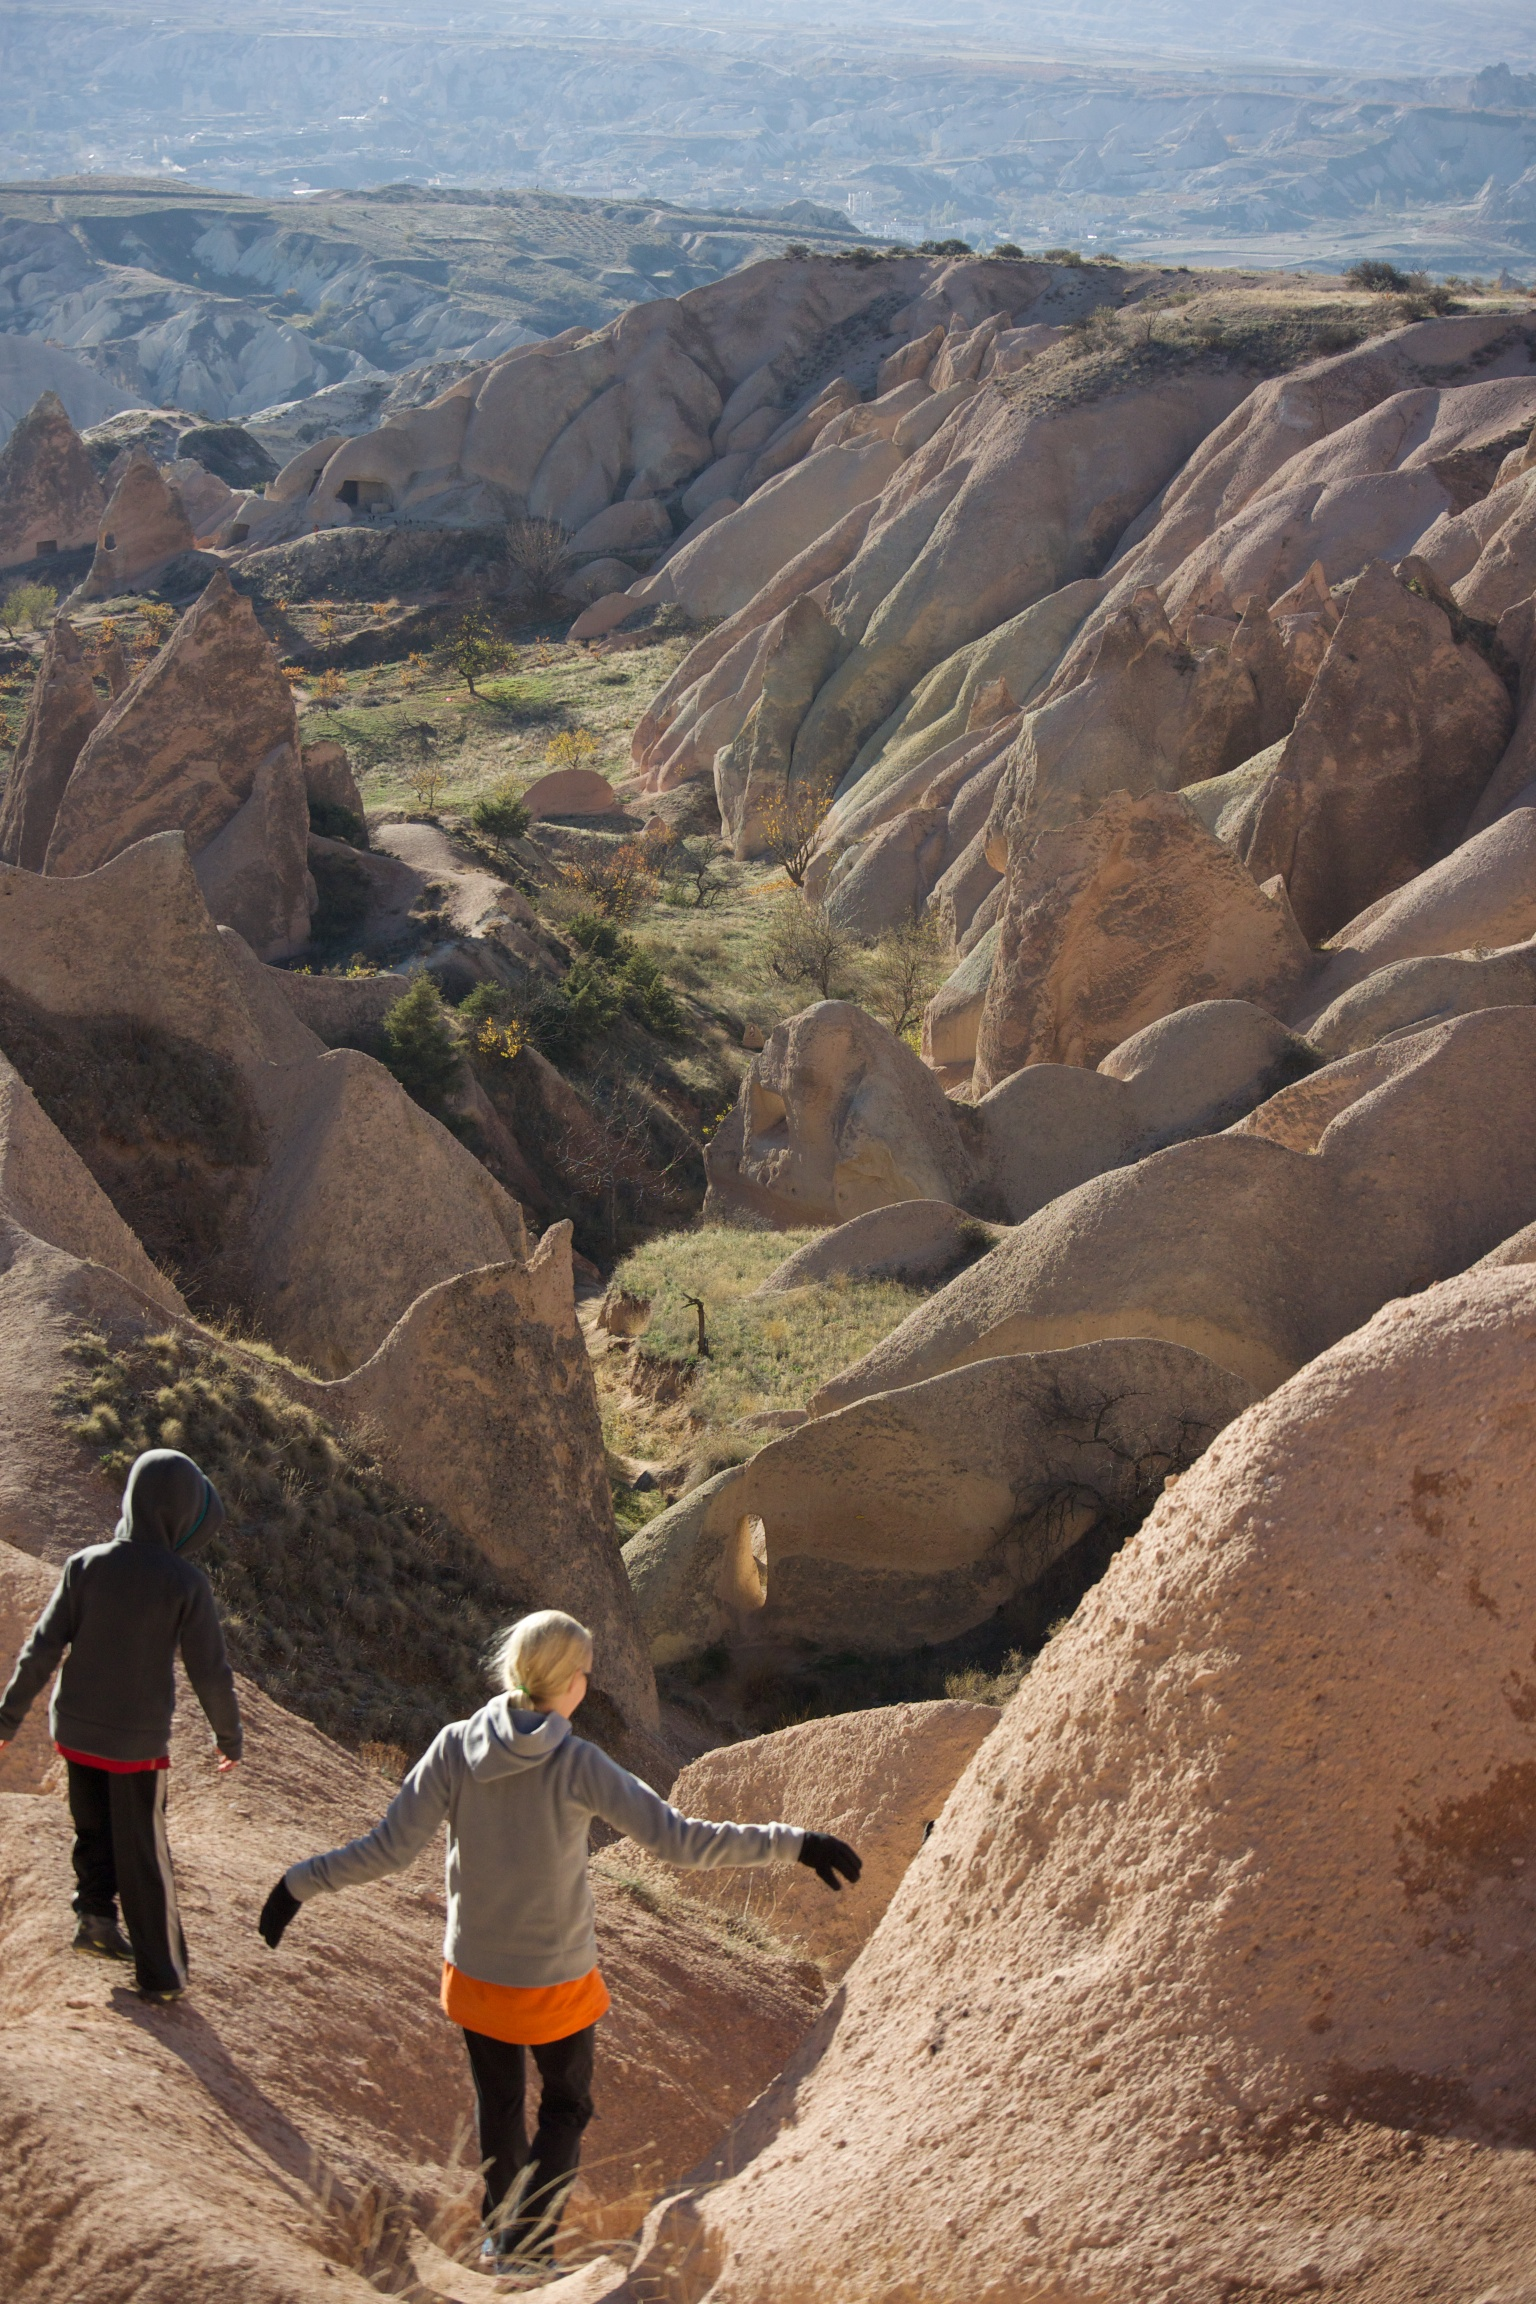 cappadocia-onthegroundD 2.jpg